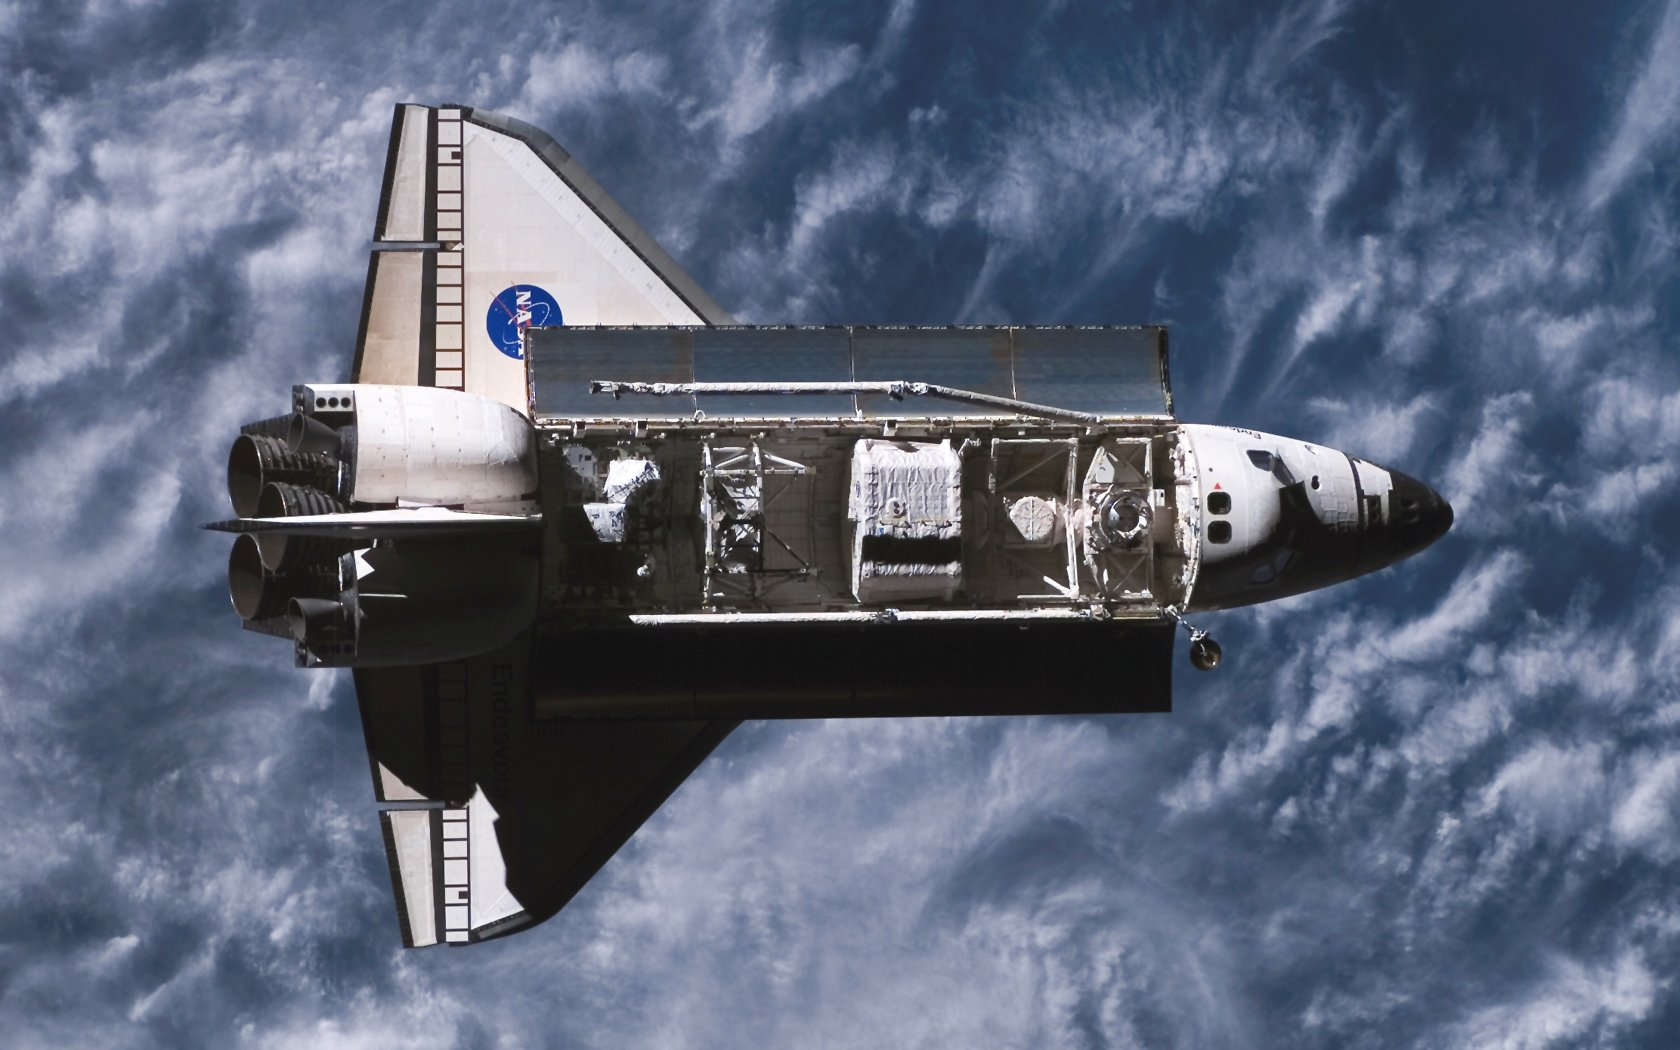 space shuttle endeavour size - photo #28